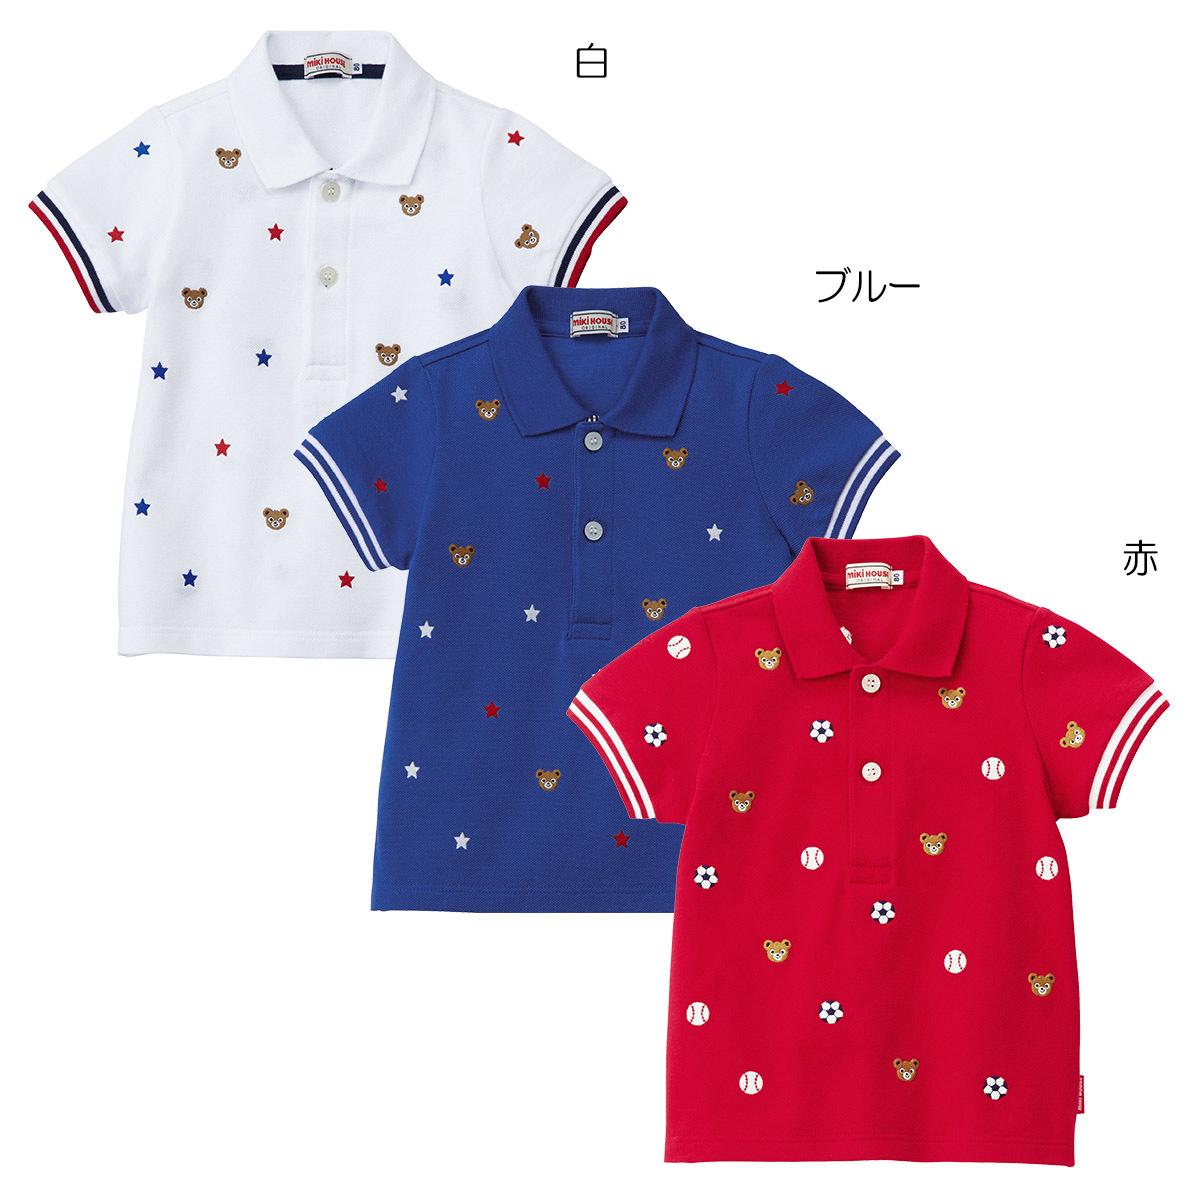 【MIKIHOUSE ミキハウス】プッチー プチ刺繍入り半袖ポロシャツ(80cm・90cm・100cm)